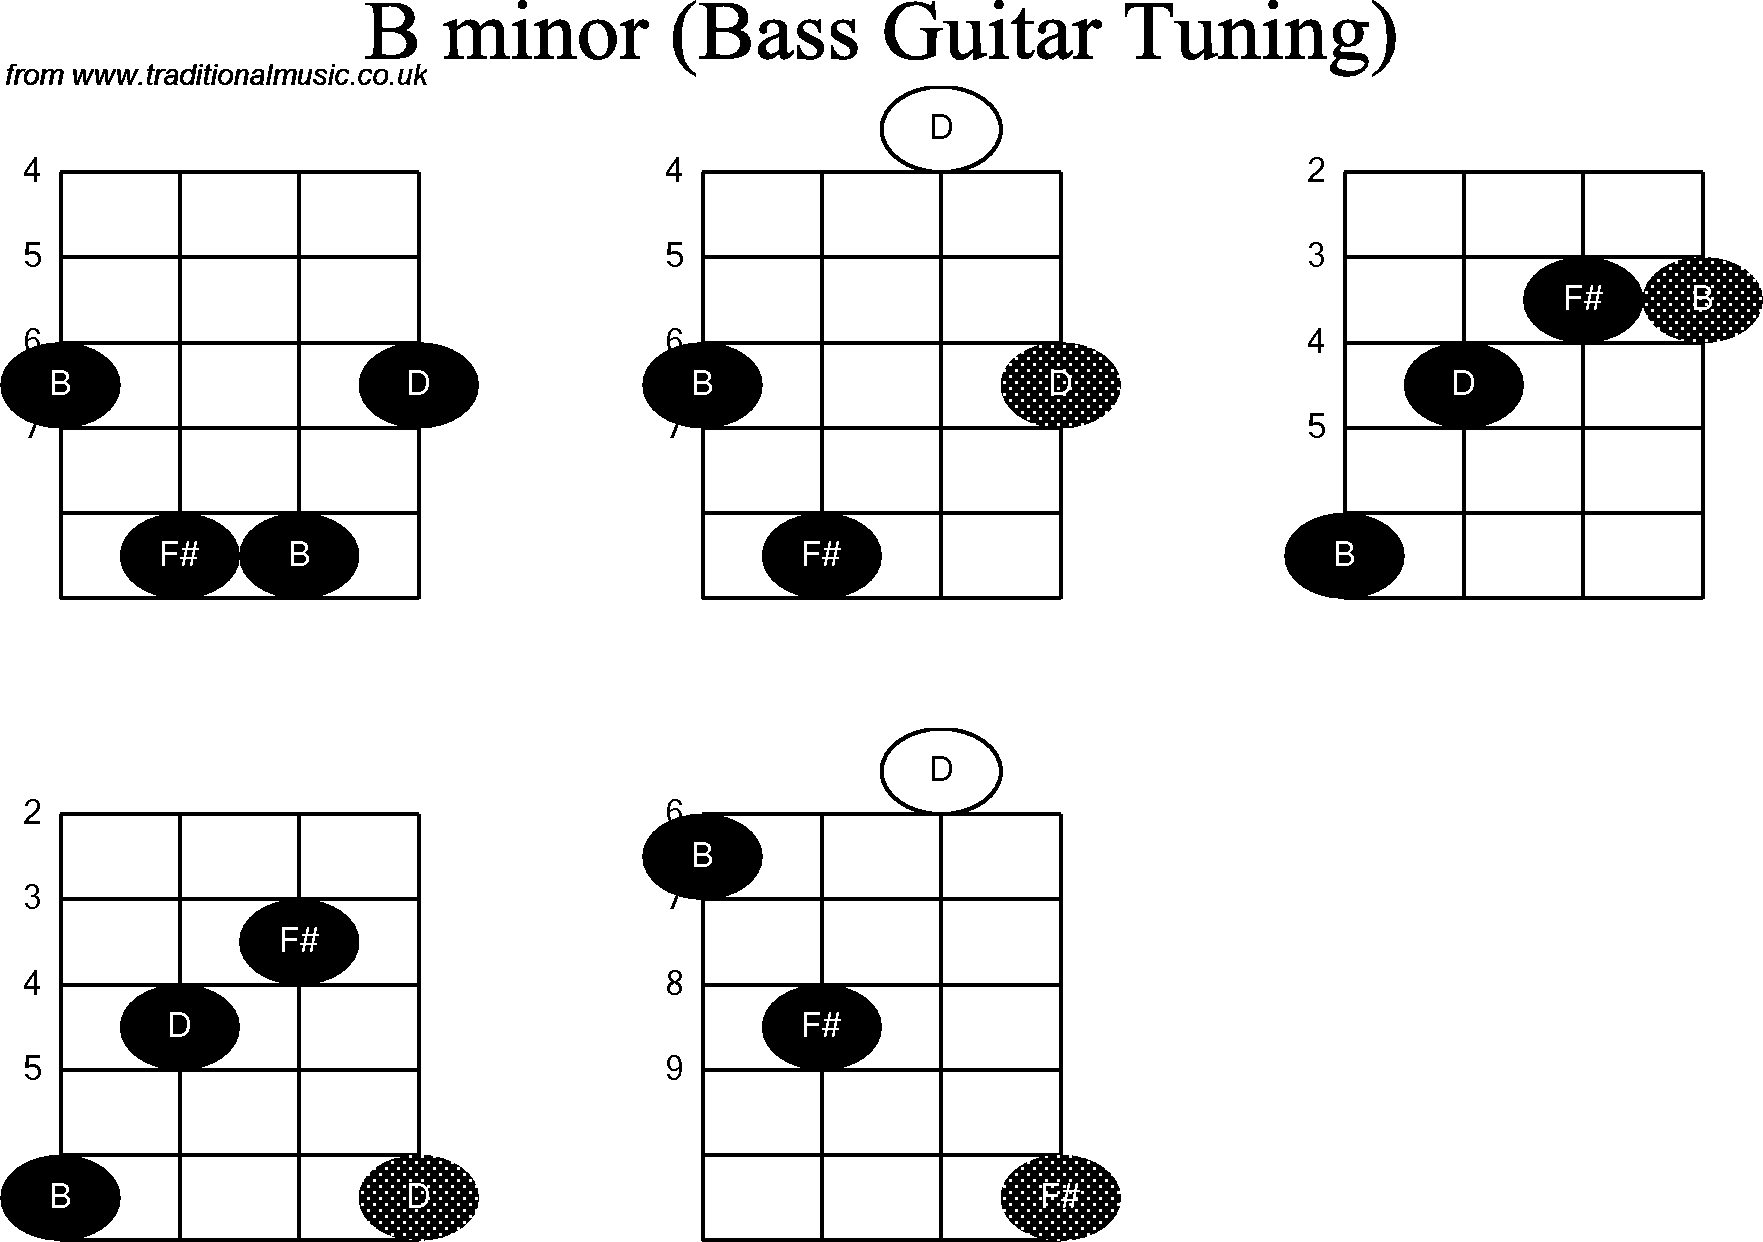 Bass Guitar Chords Bass Guitar Chord Diagrams For B Minor